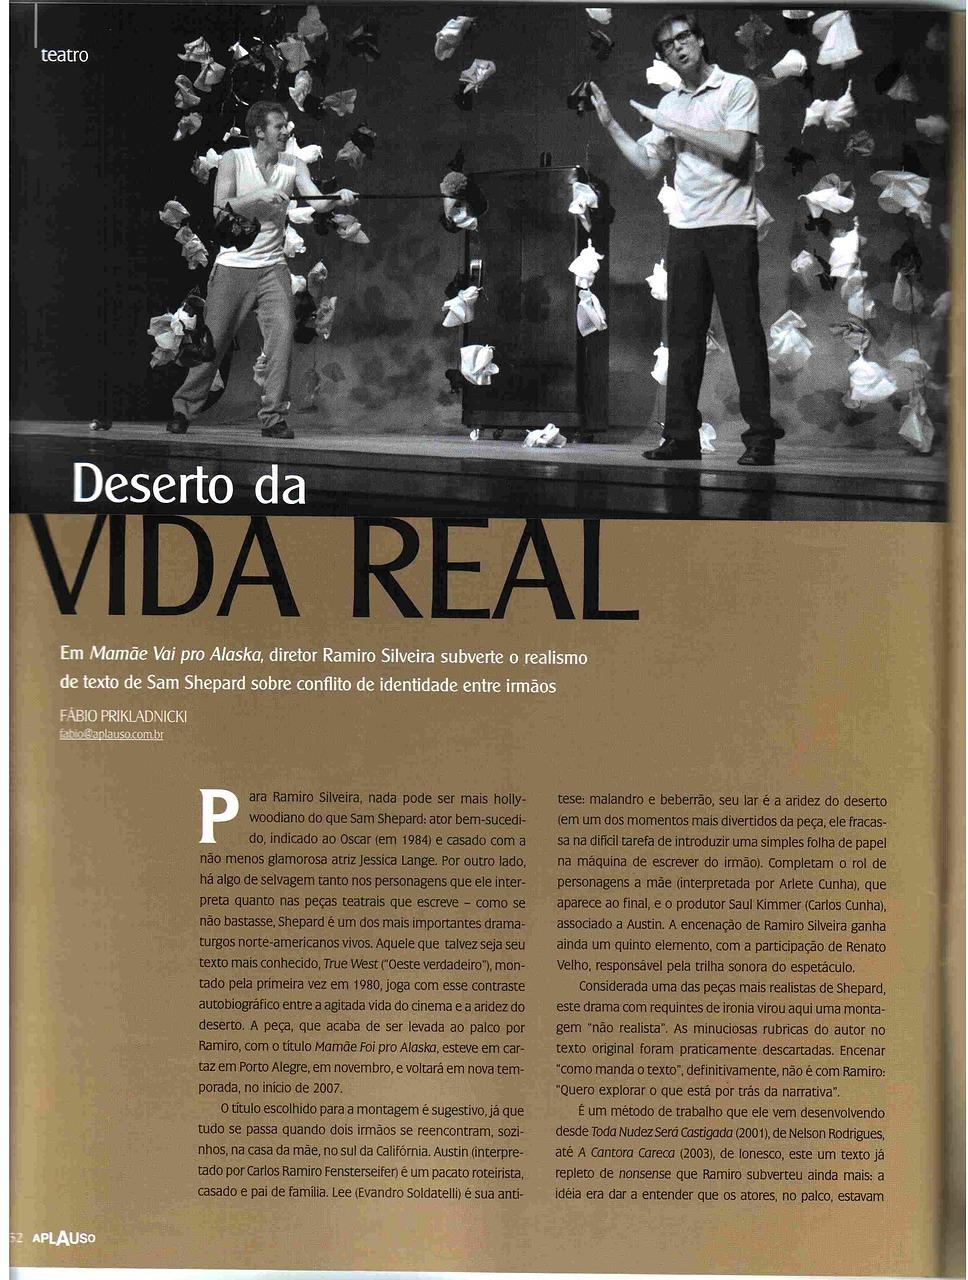 Revista+Aplauso+nº+81+-+Dez+2006+-+1ª+pg.jpg